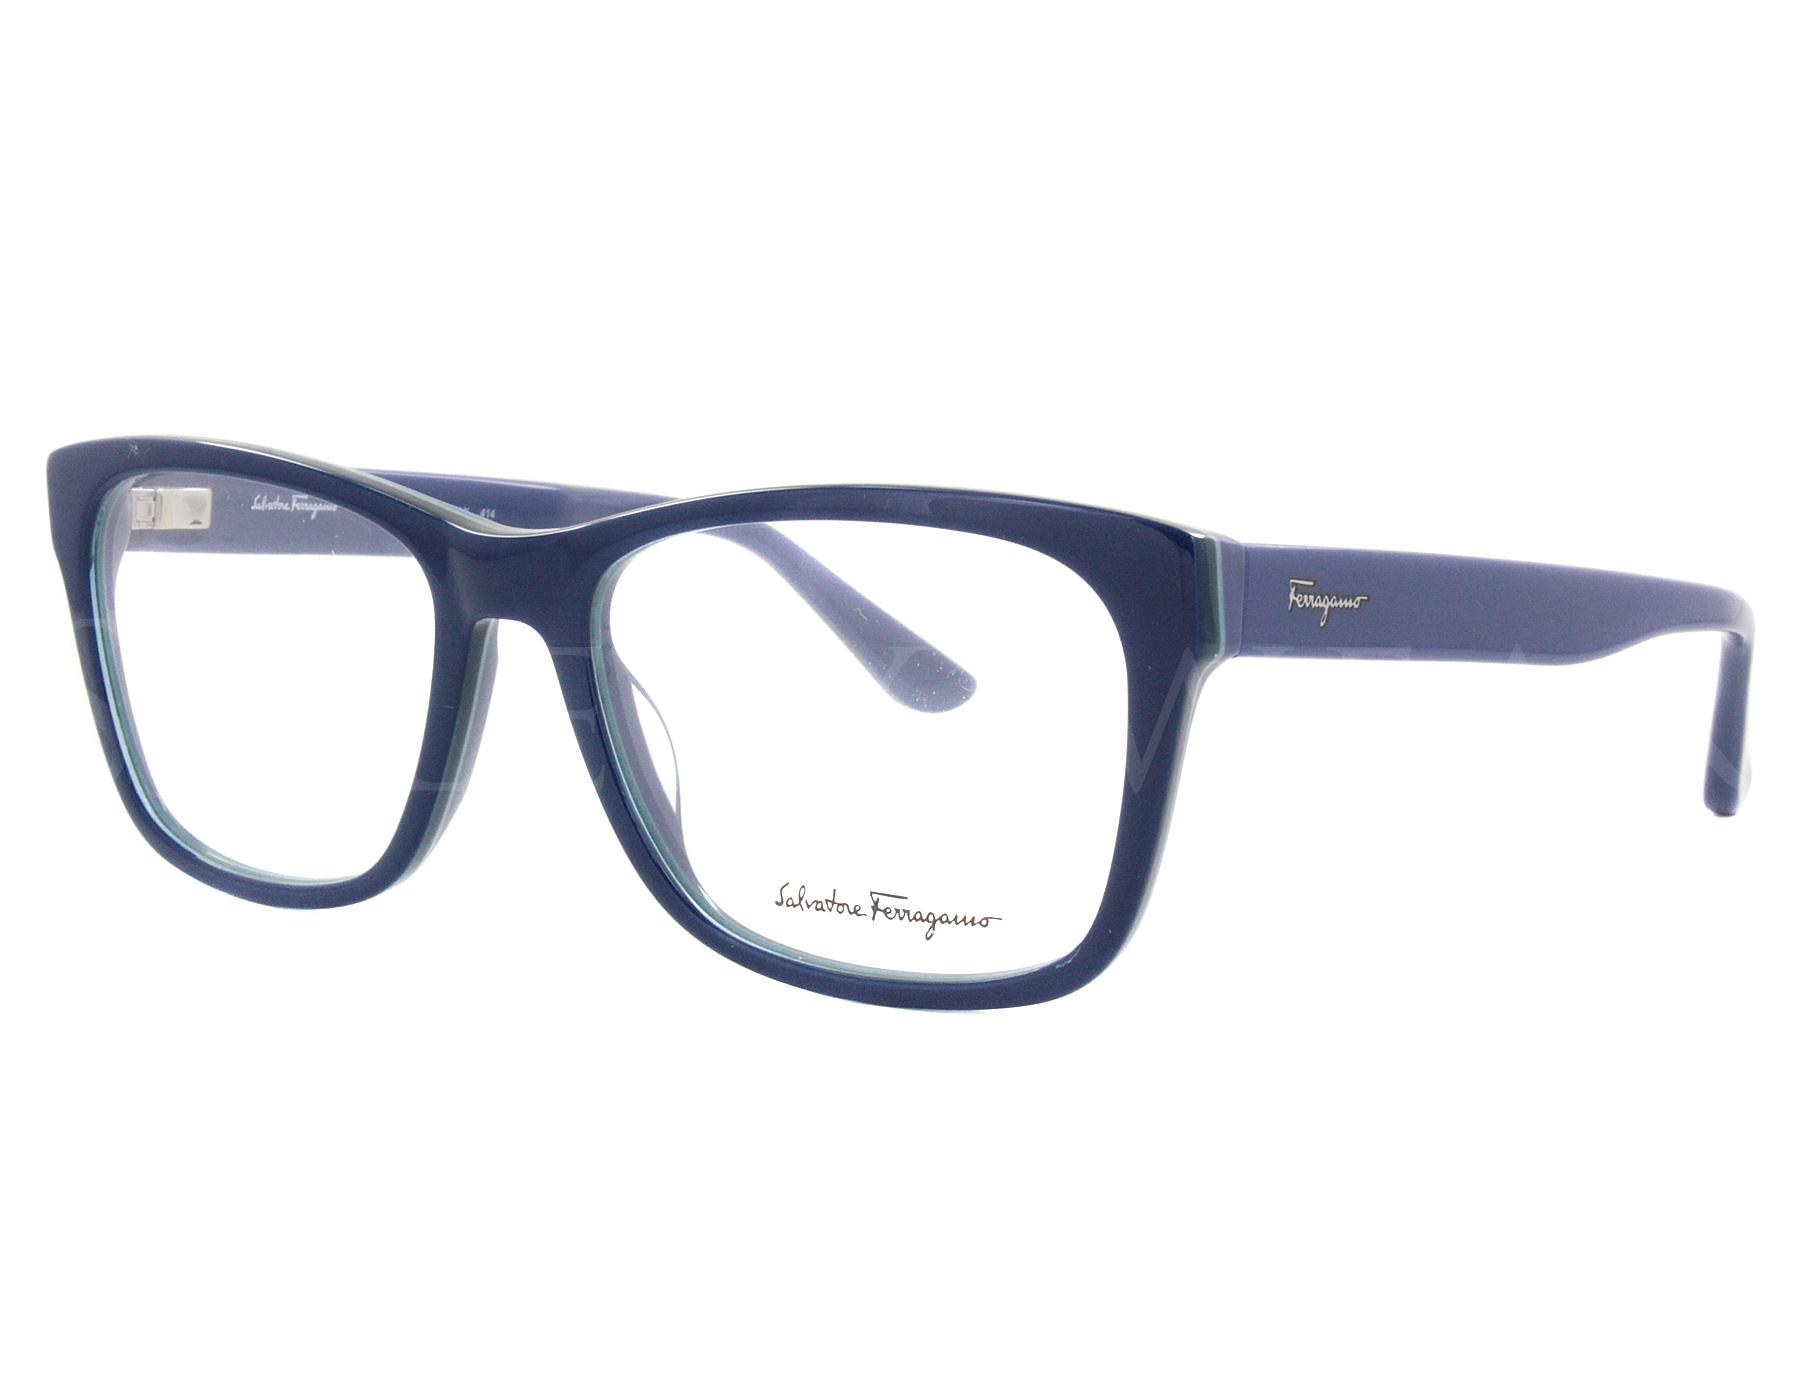 7f04bd7387 Details about NEW Salvatore Ferragamo SF2693 412 55mm Blue Navy Optical  Eyeglasses Frames